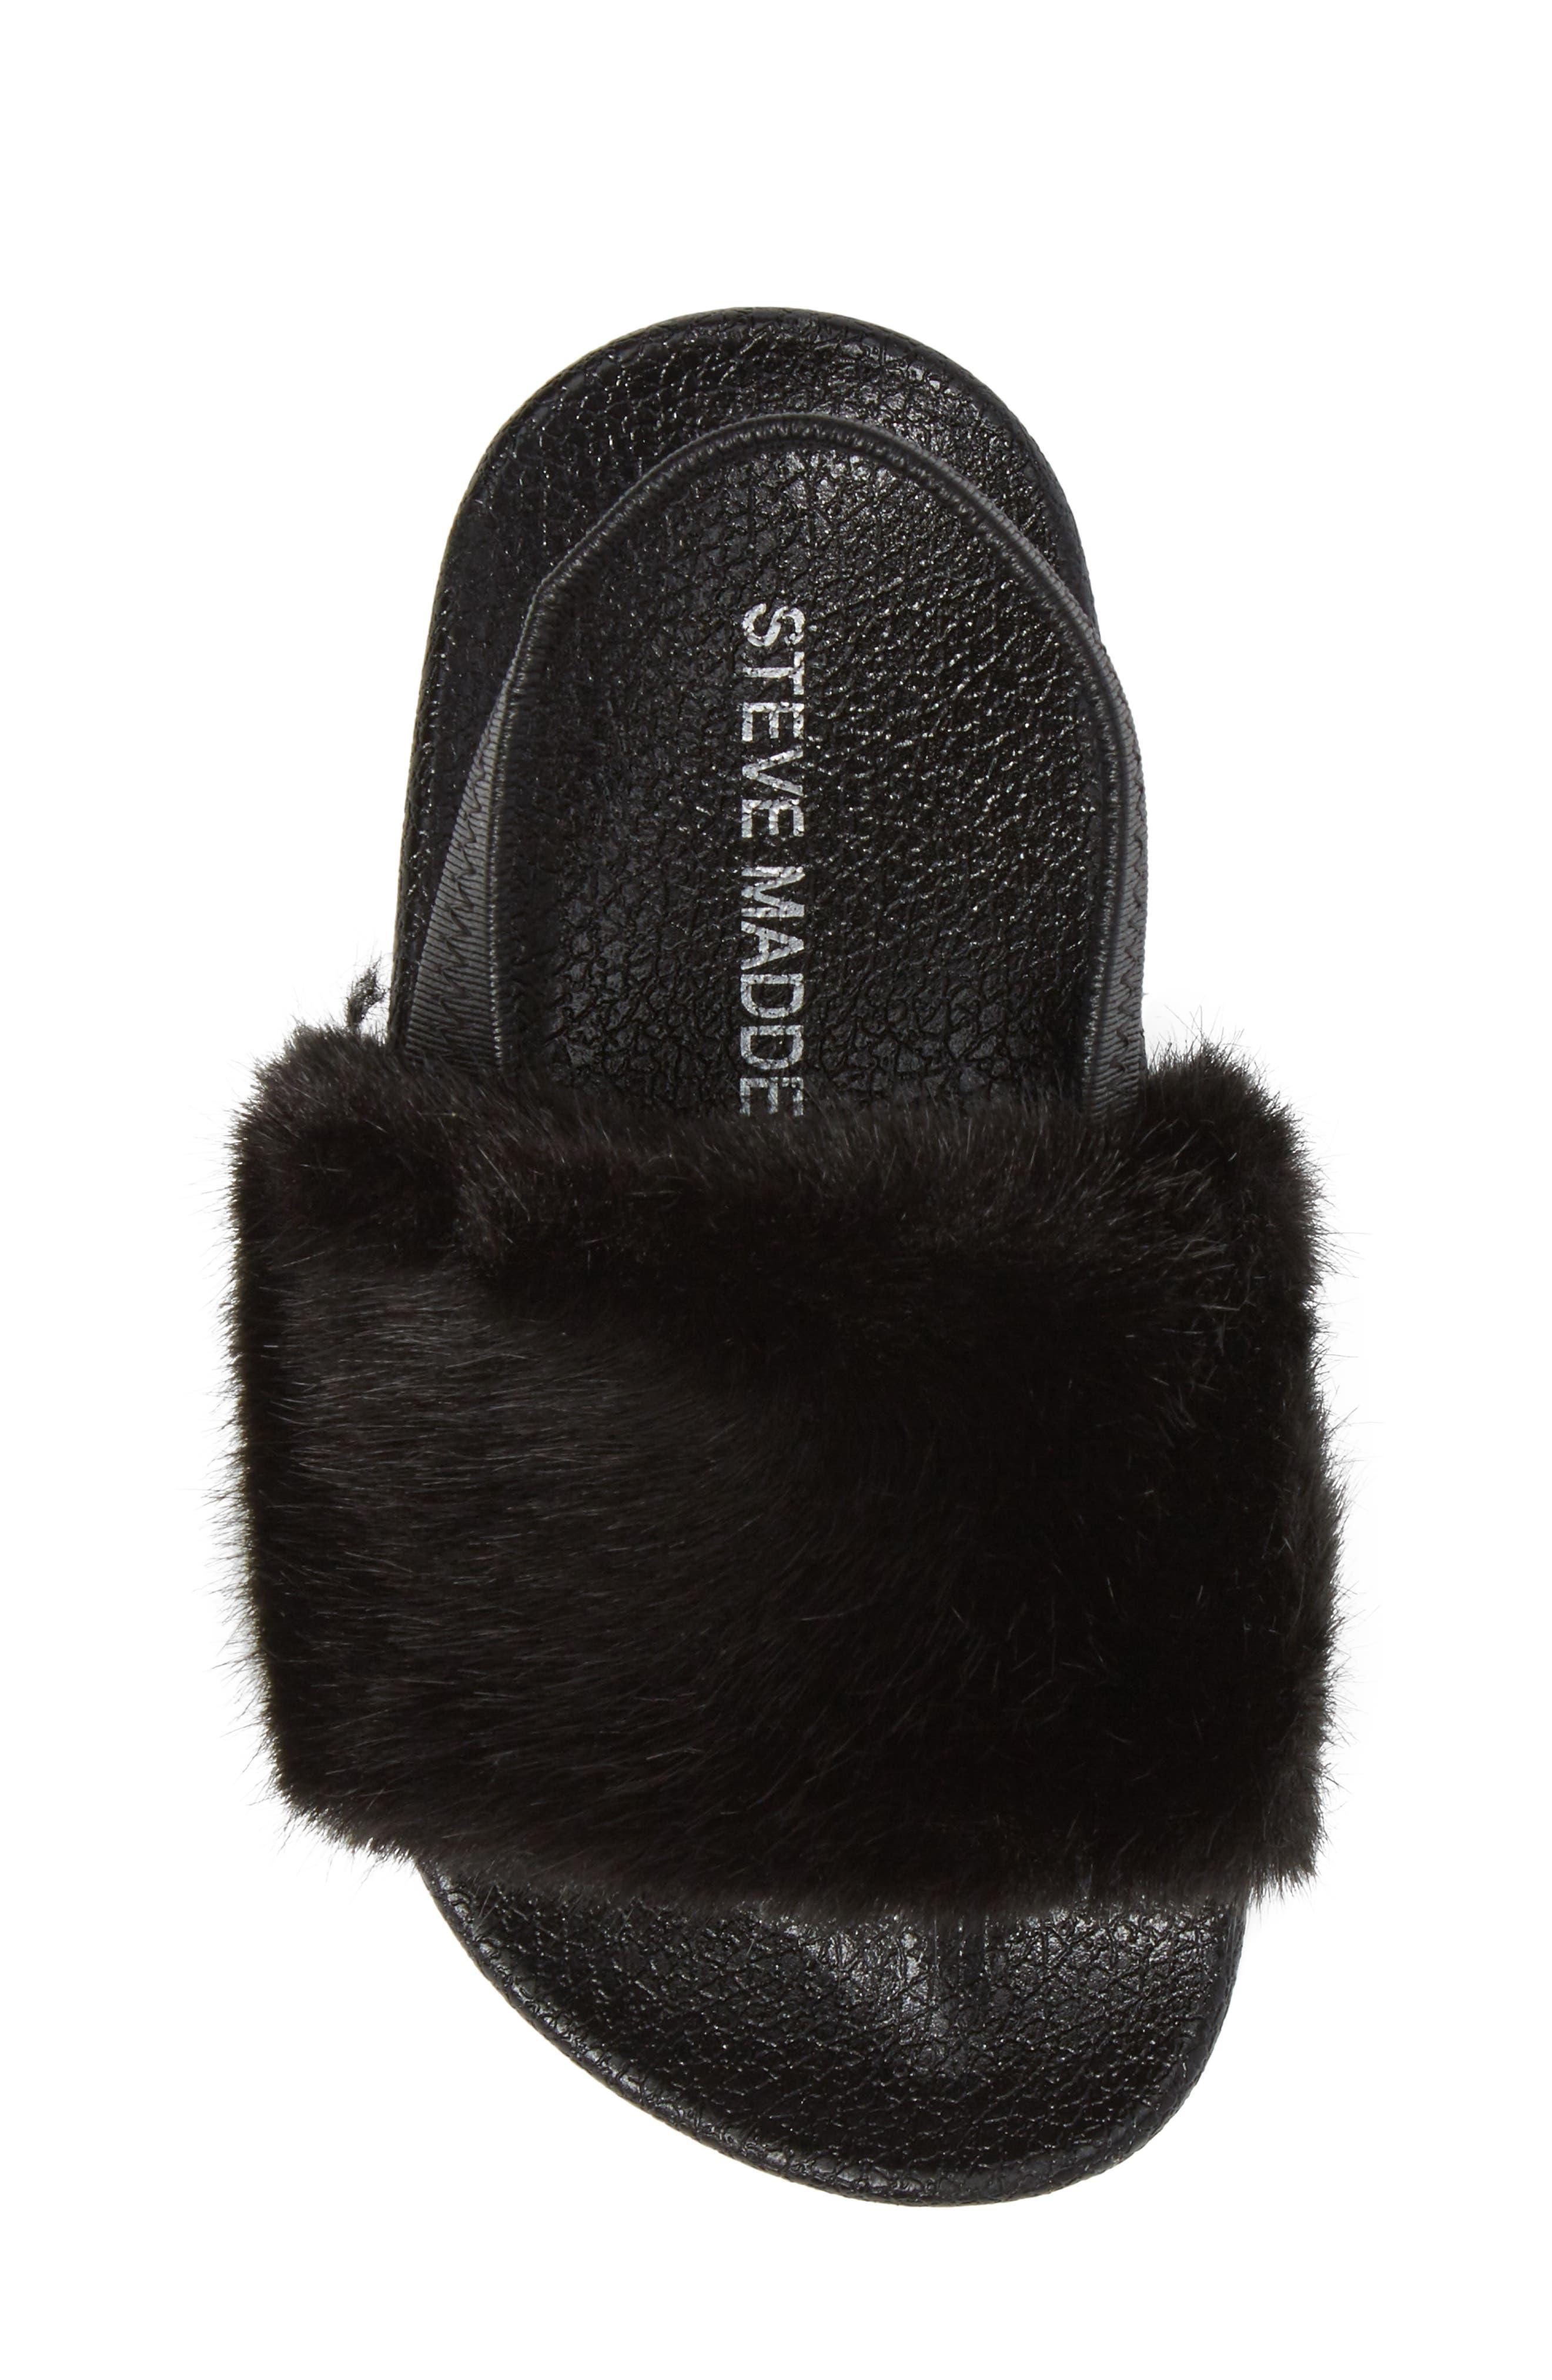 Tsoftey Faux Fur Slide Sandal,                             Alternate thumbnail 5, color,                             006